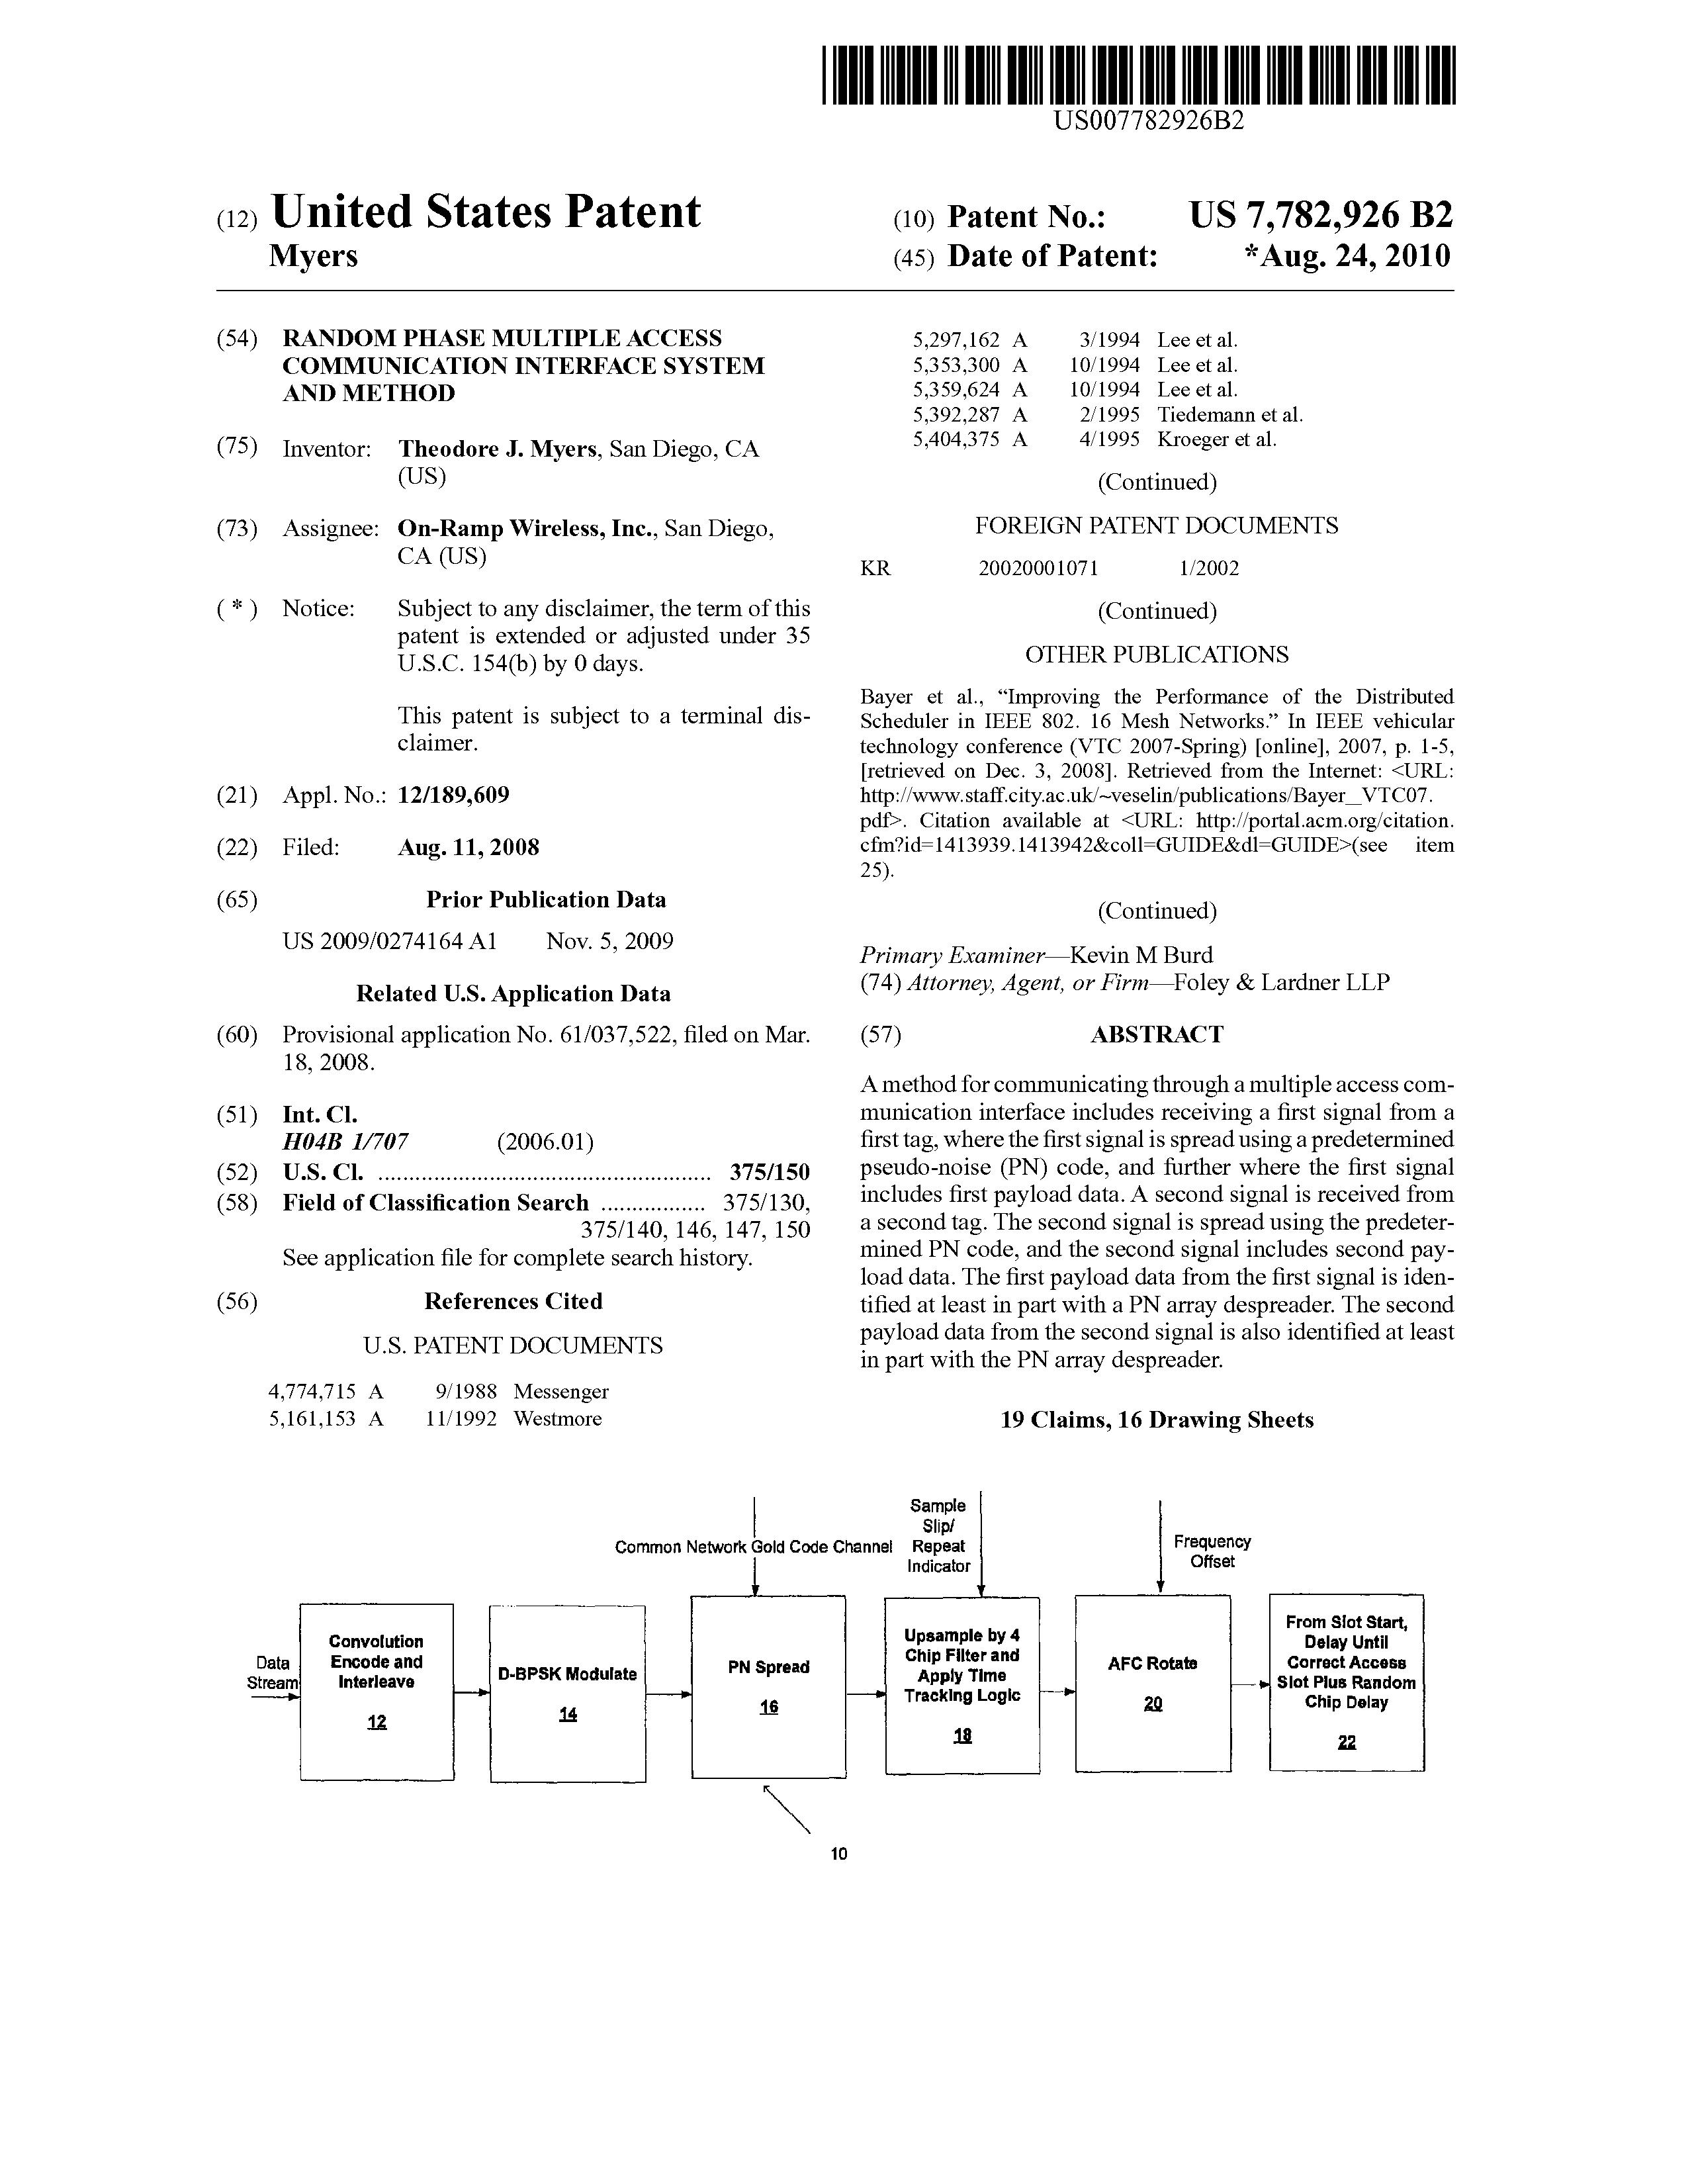 US 7782926 B2 - Random Phase Multiple Access Communication